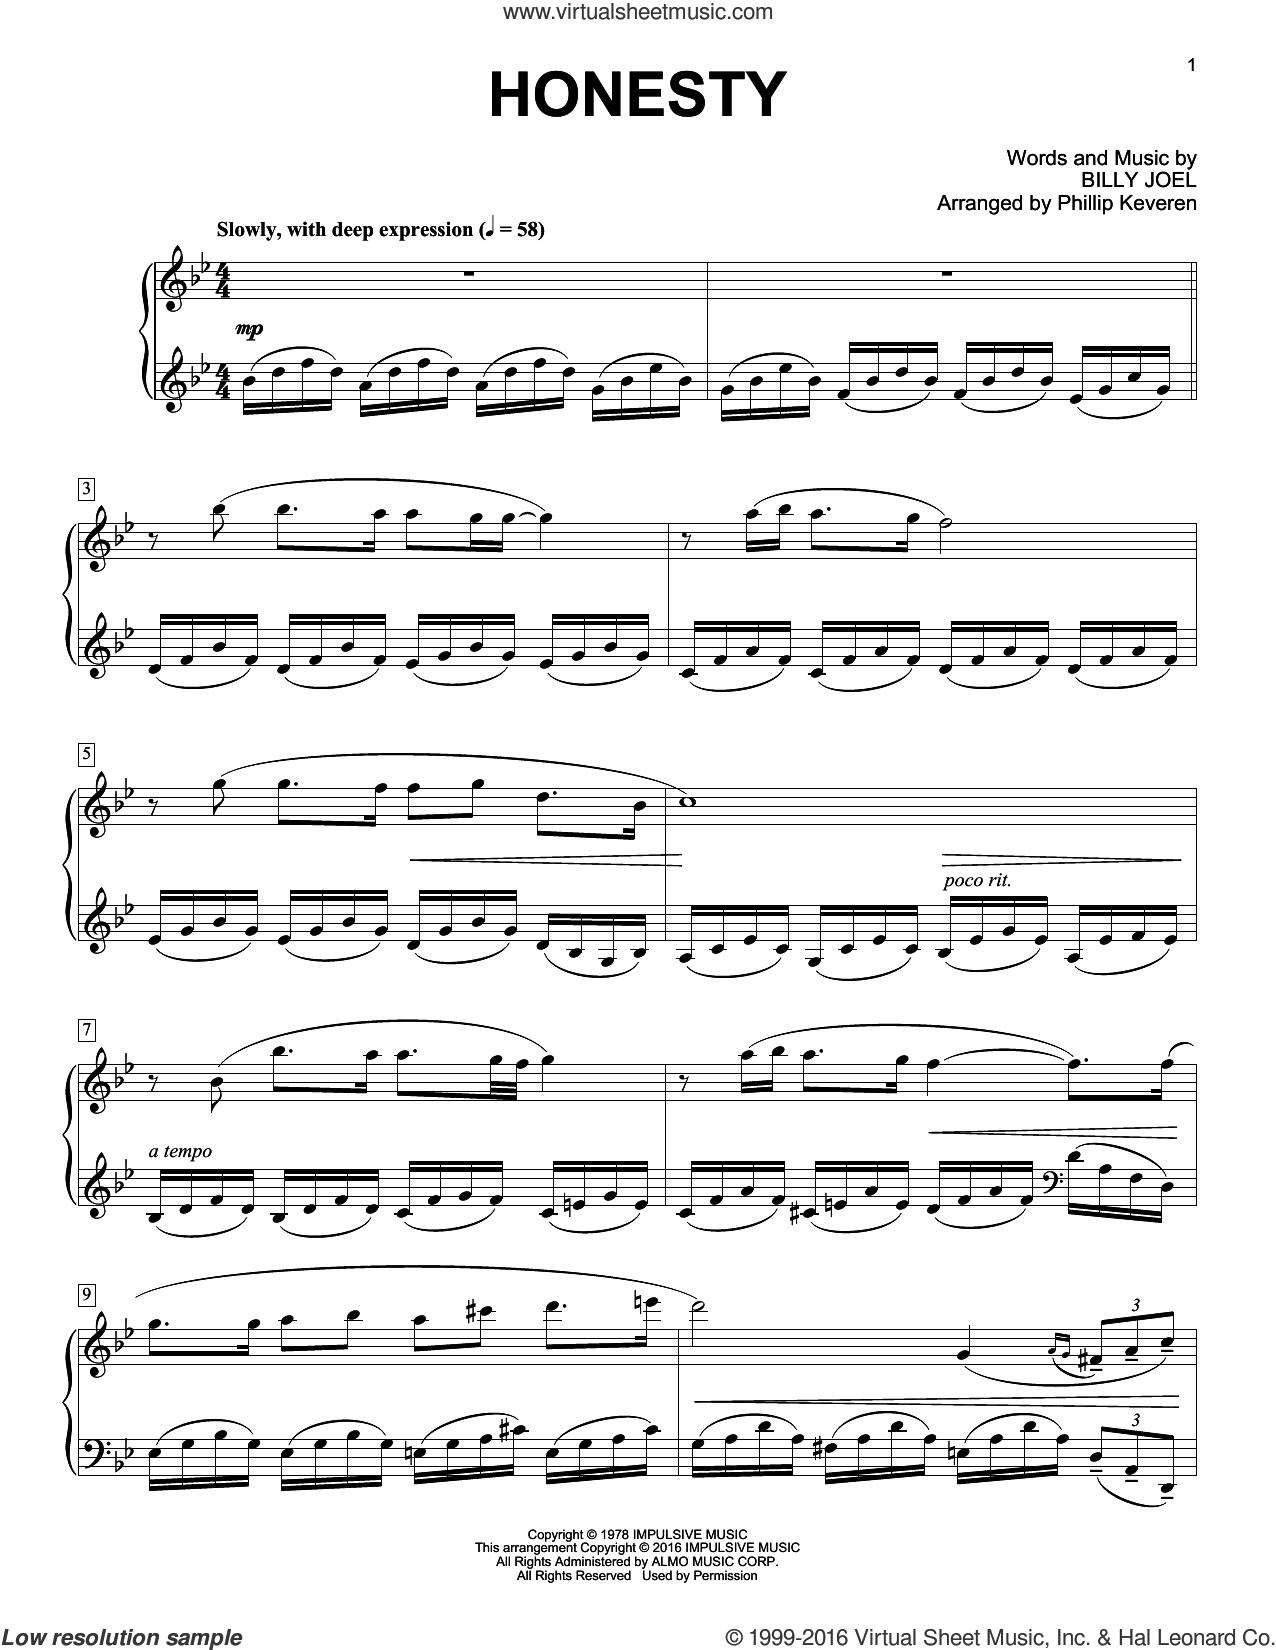 Honesty sheet music for piano solo by Phillip Keveren, Billy Joel and Billy Joel (Arr. Phillip Keveren), intermediate skill level